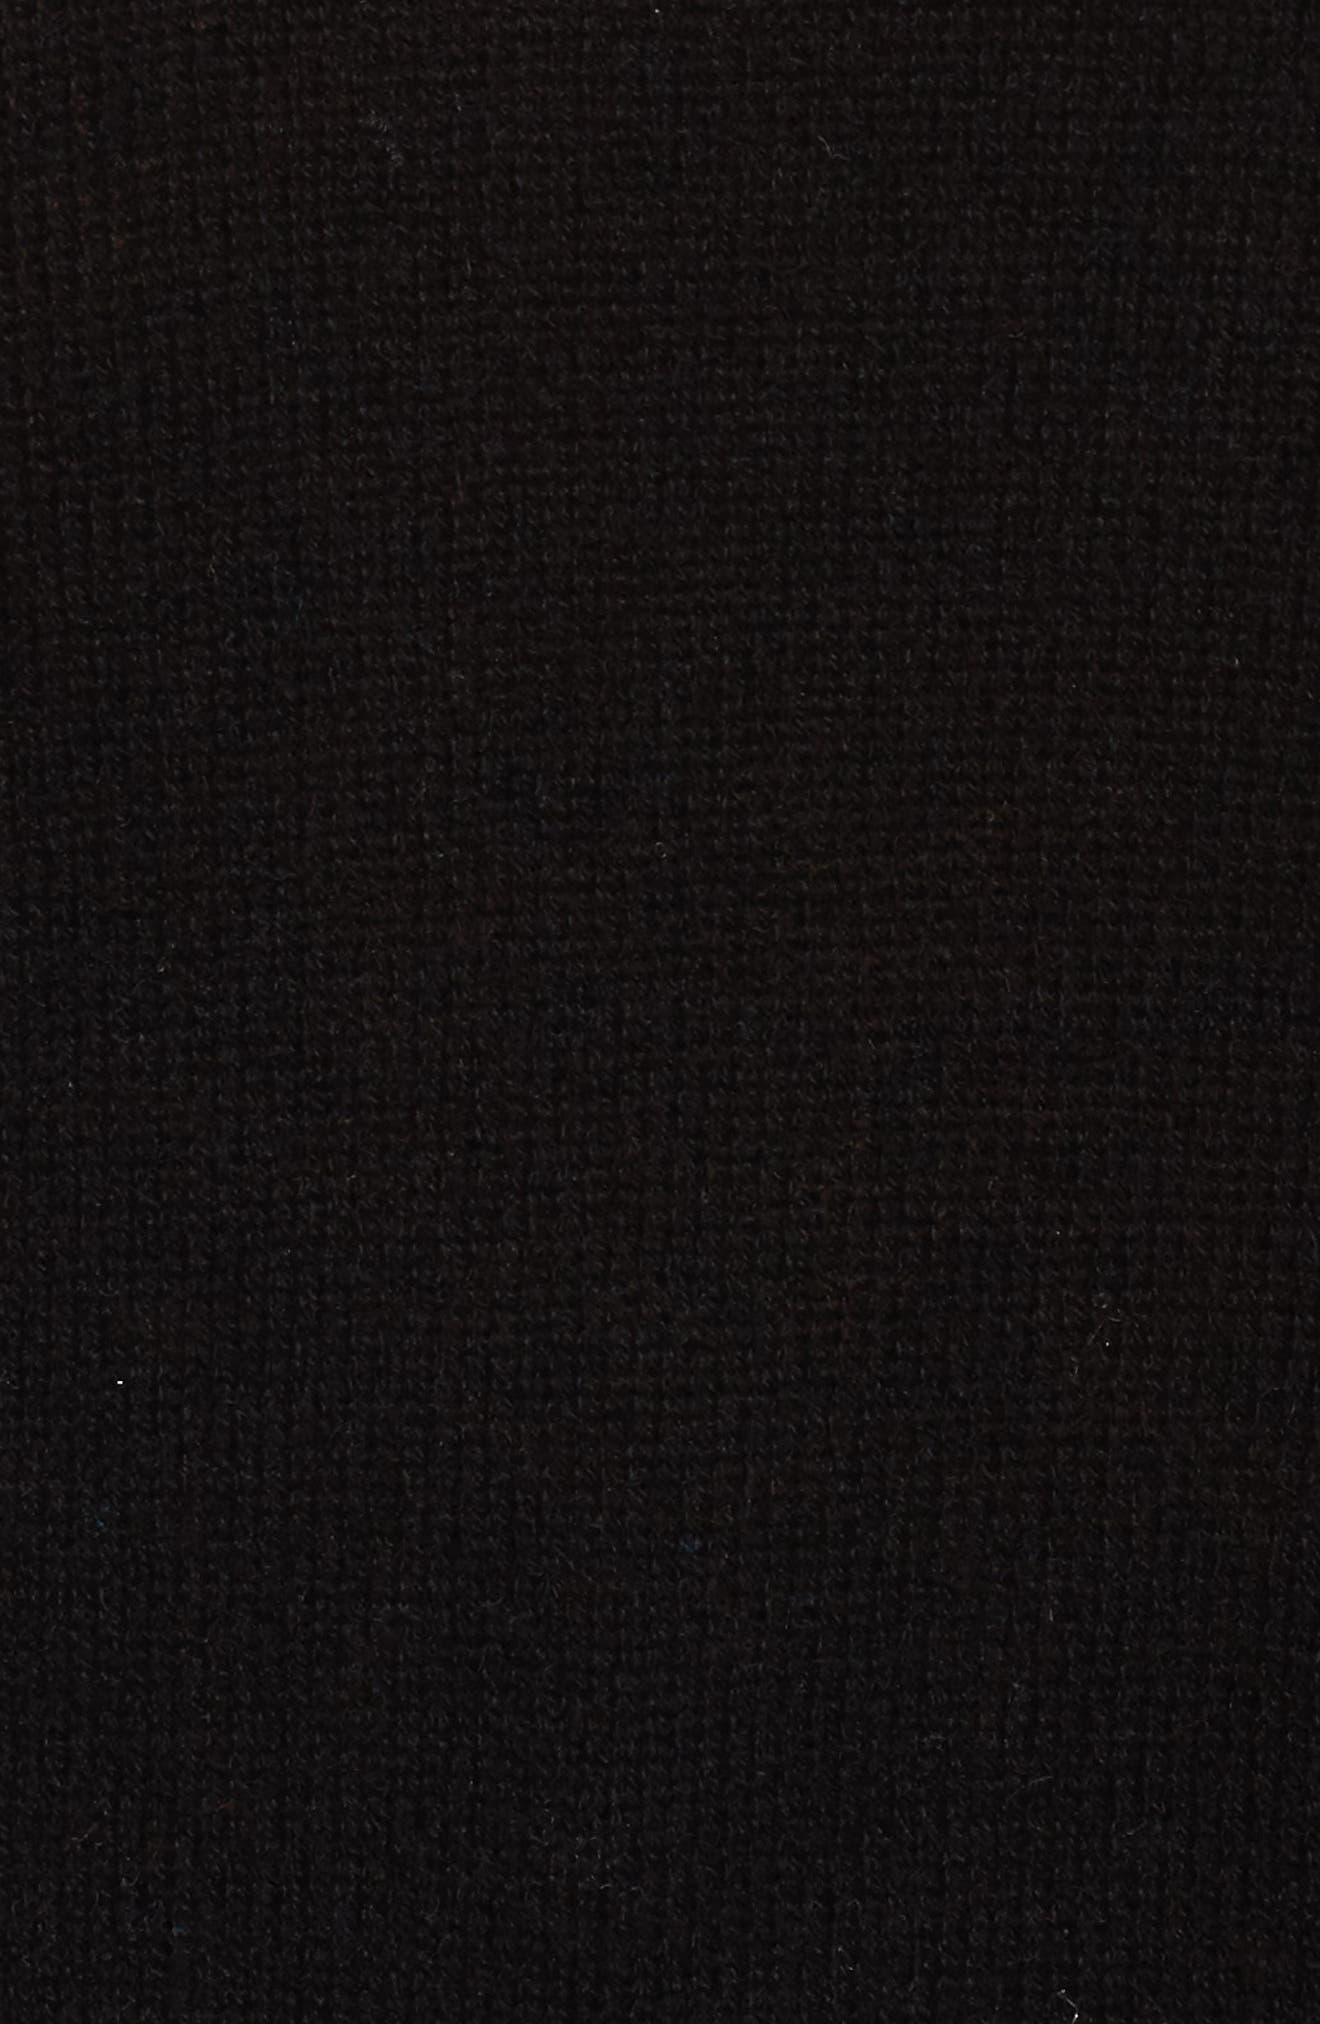 Crewneck Side Split Wool & Cashmere Pullover,                             Alternate thumbnail 5, color,                             Black